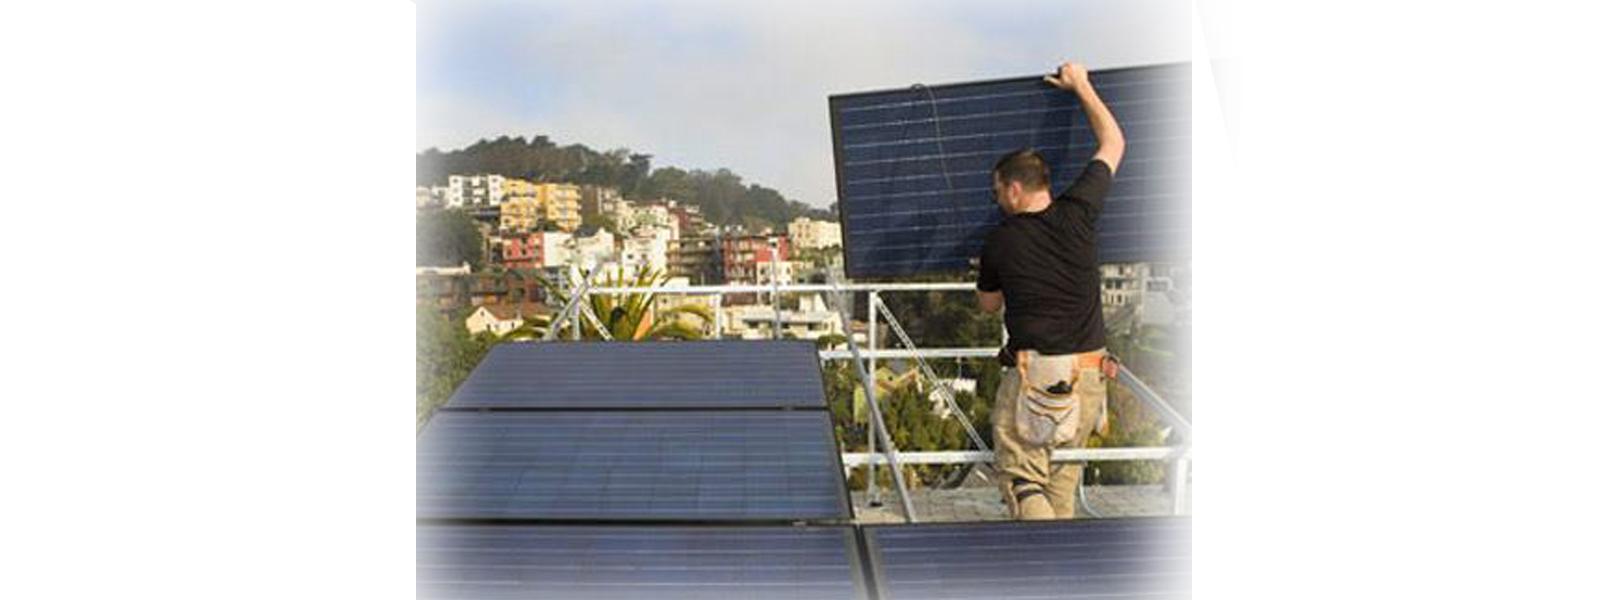 curso-energia-solar-fotovoltaica-sao-paulo